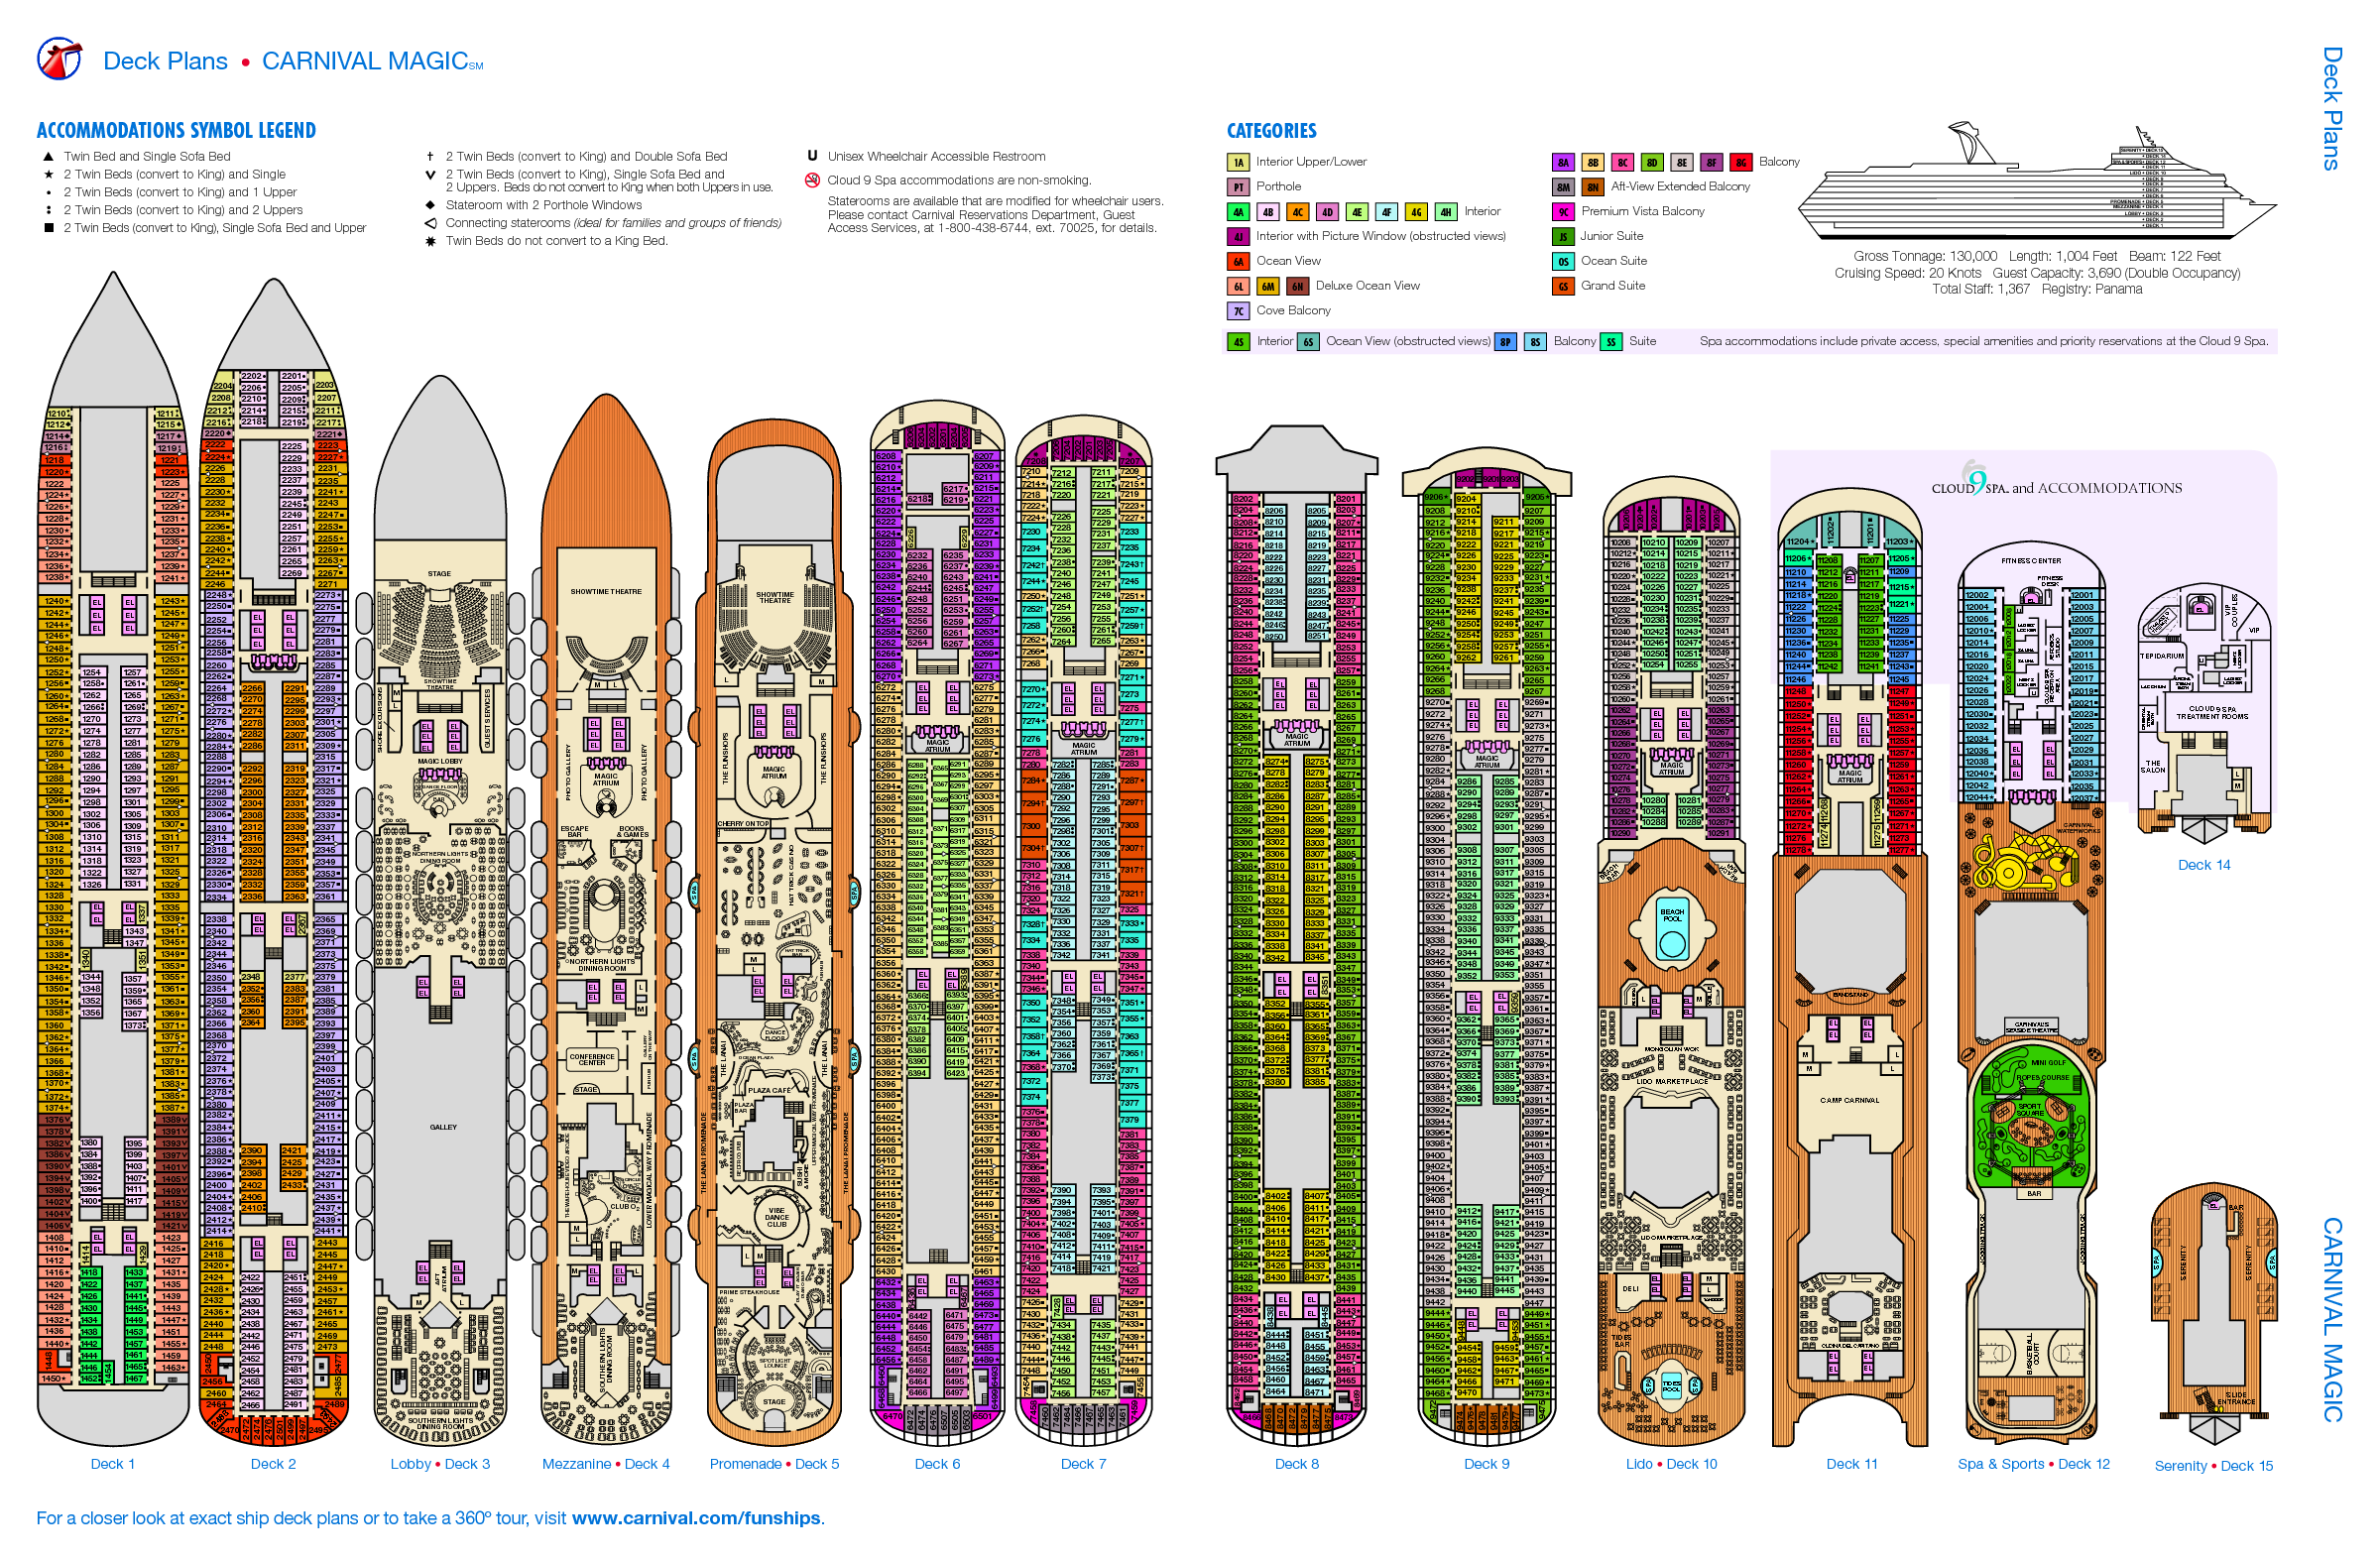 carnival cruise ship diagram ls1 intake pin by mandy williams on cruisin magic deck plans http img docstoccdn com thumb